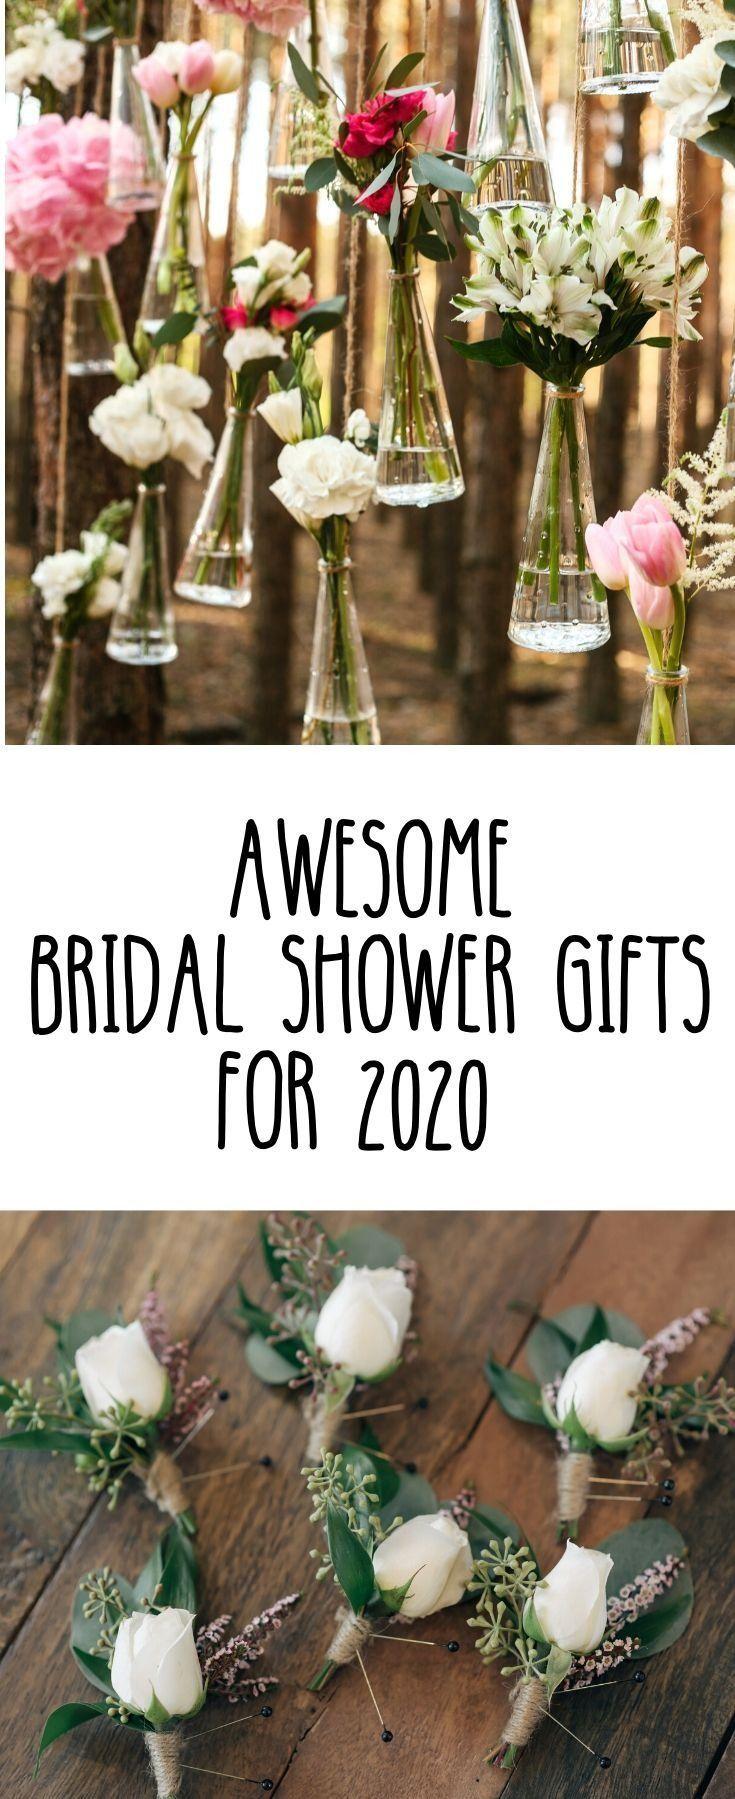 Wedding Gifts 2020 In 2020 Fun Wedding Shower Gifts Wedding Gifts For Newlyweds Bridal Shower Gifts